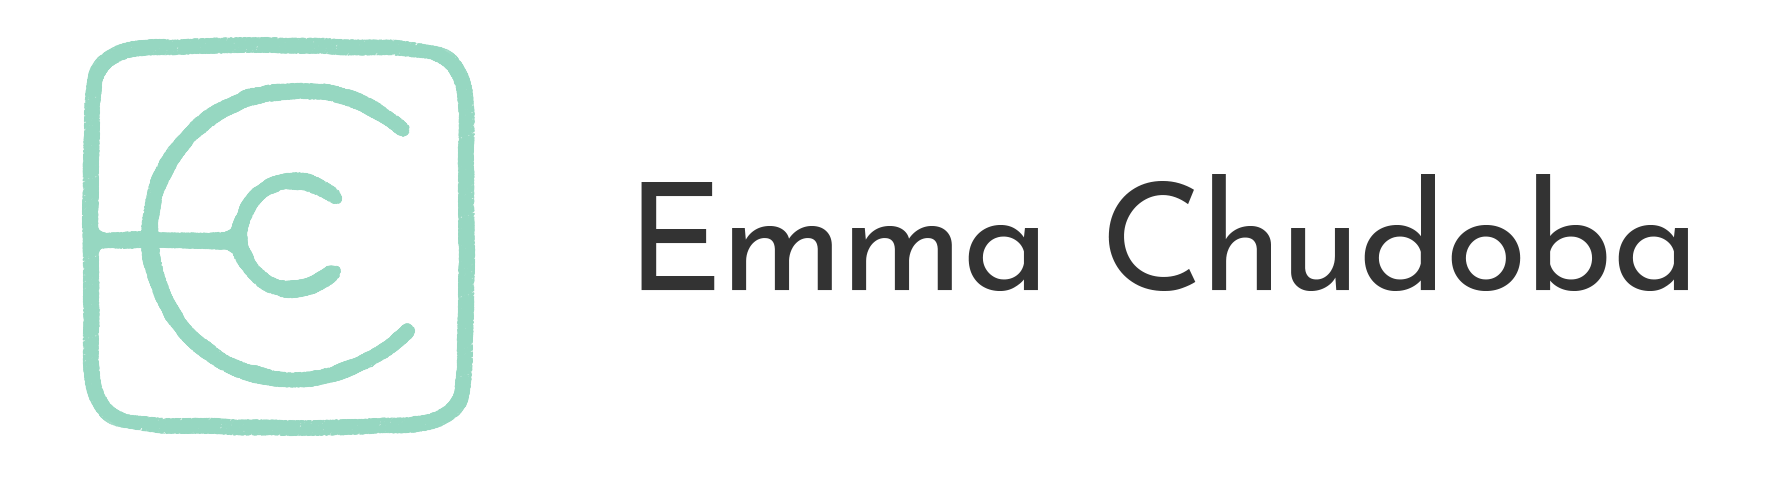 Emma Chudoba